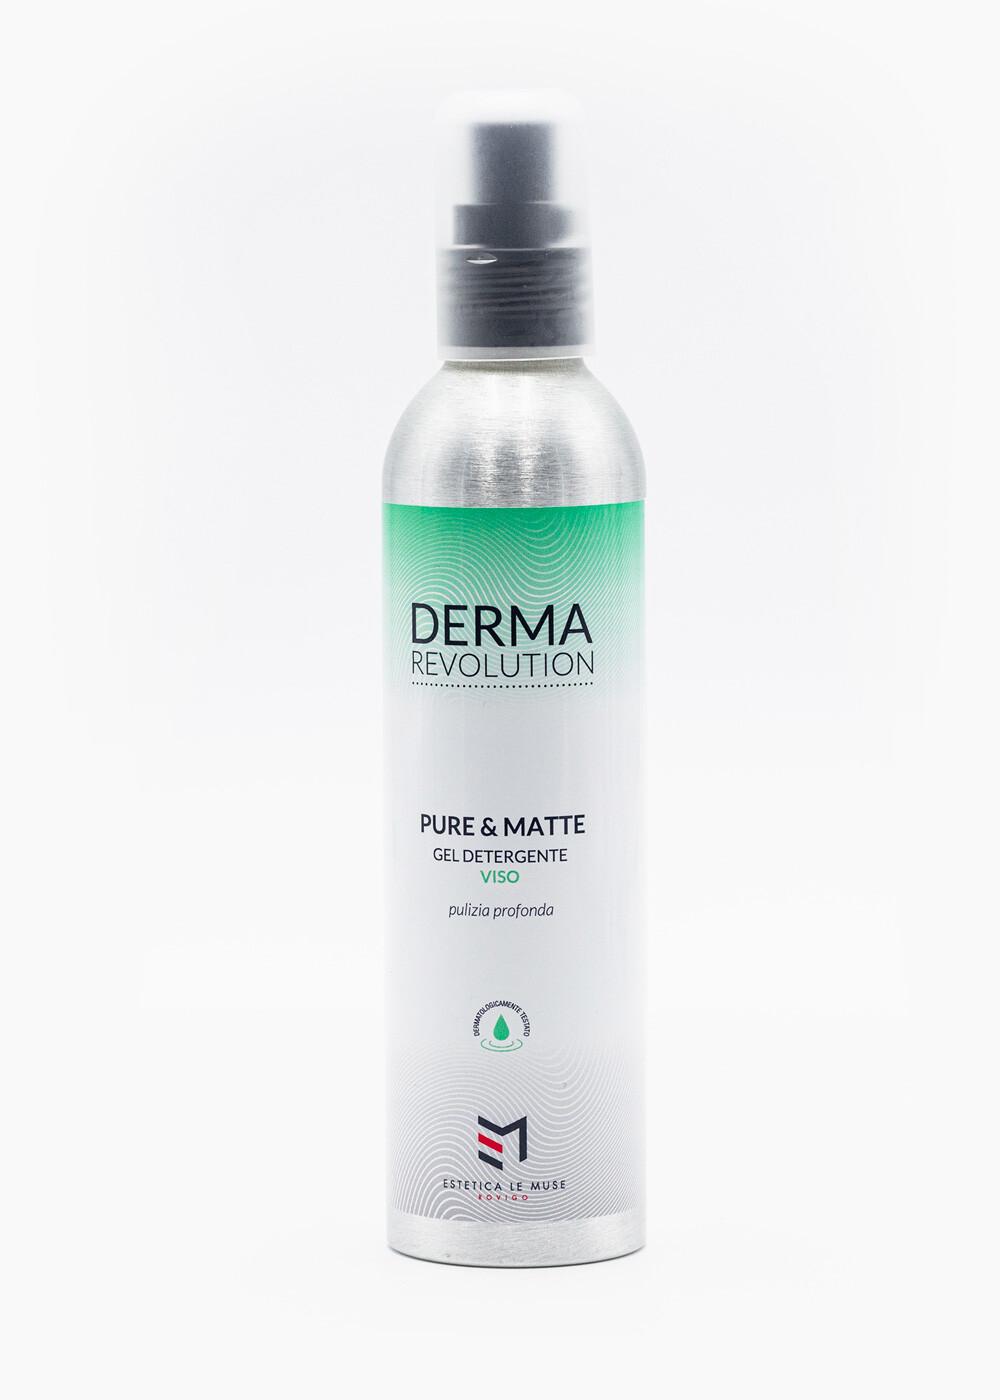 pure-and-matte-gel-detergente-viso-estetica-le-muse-first